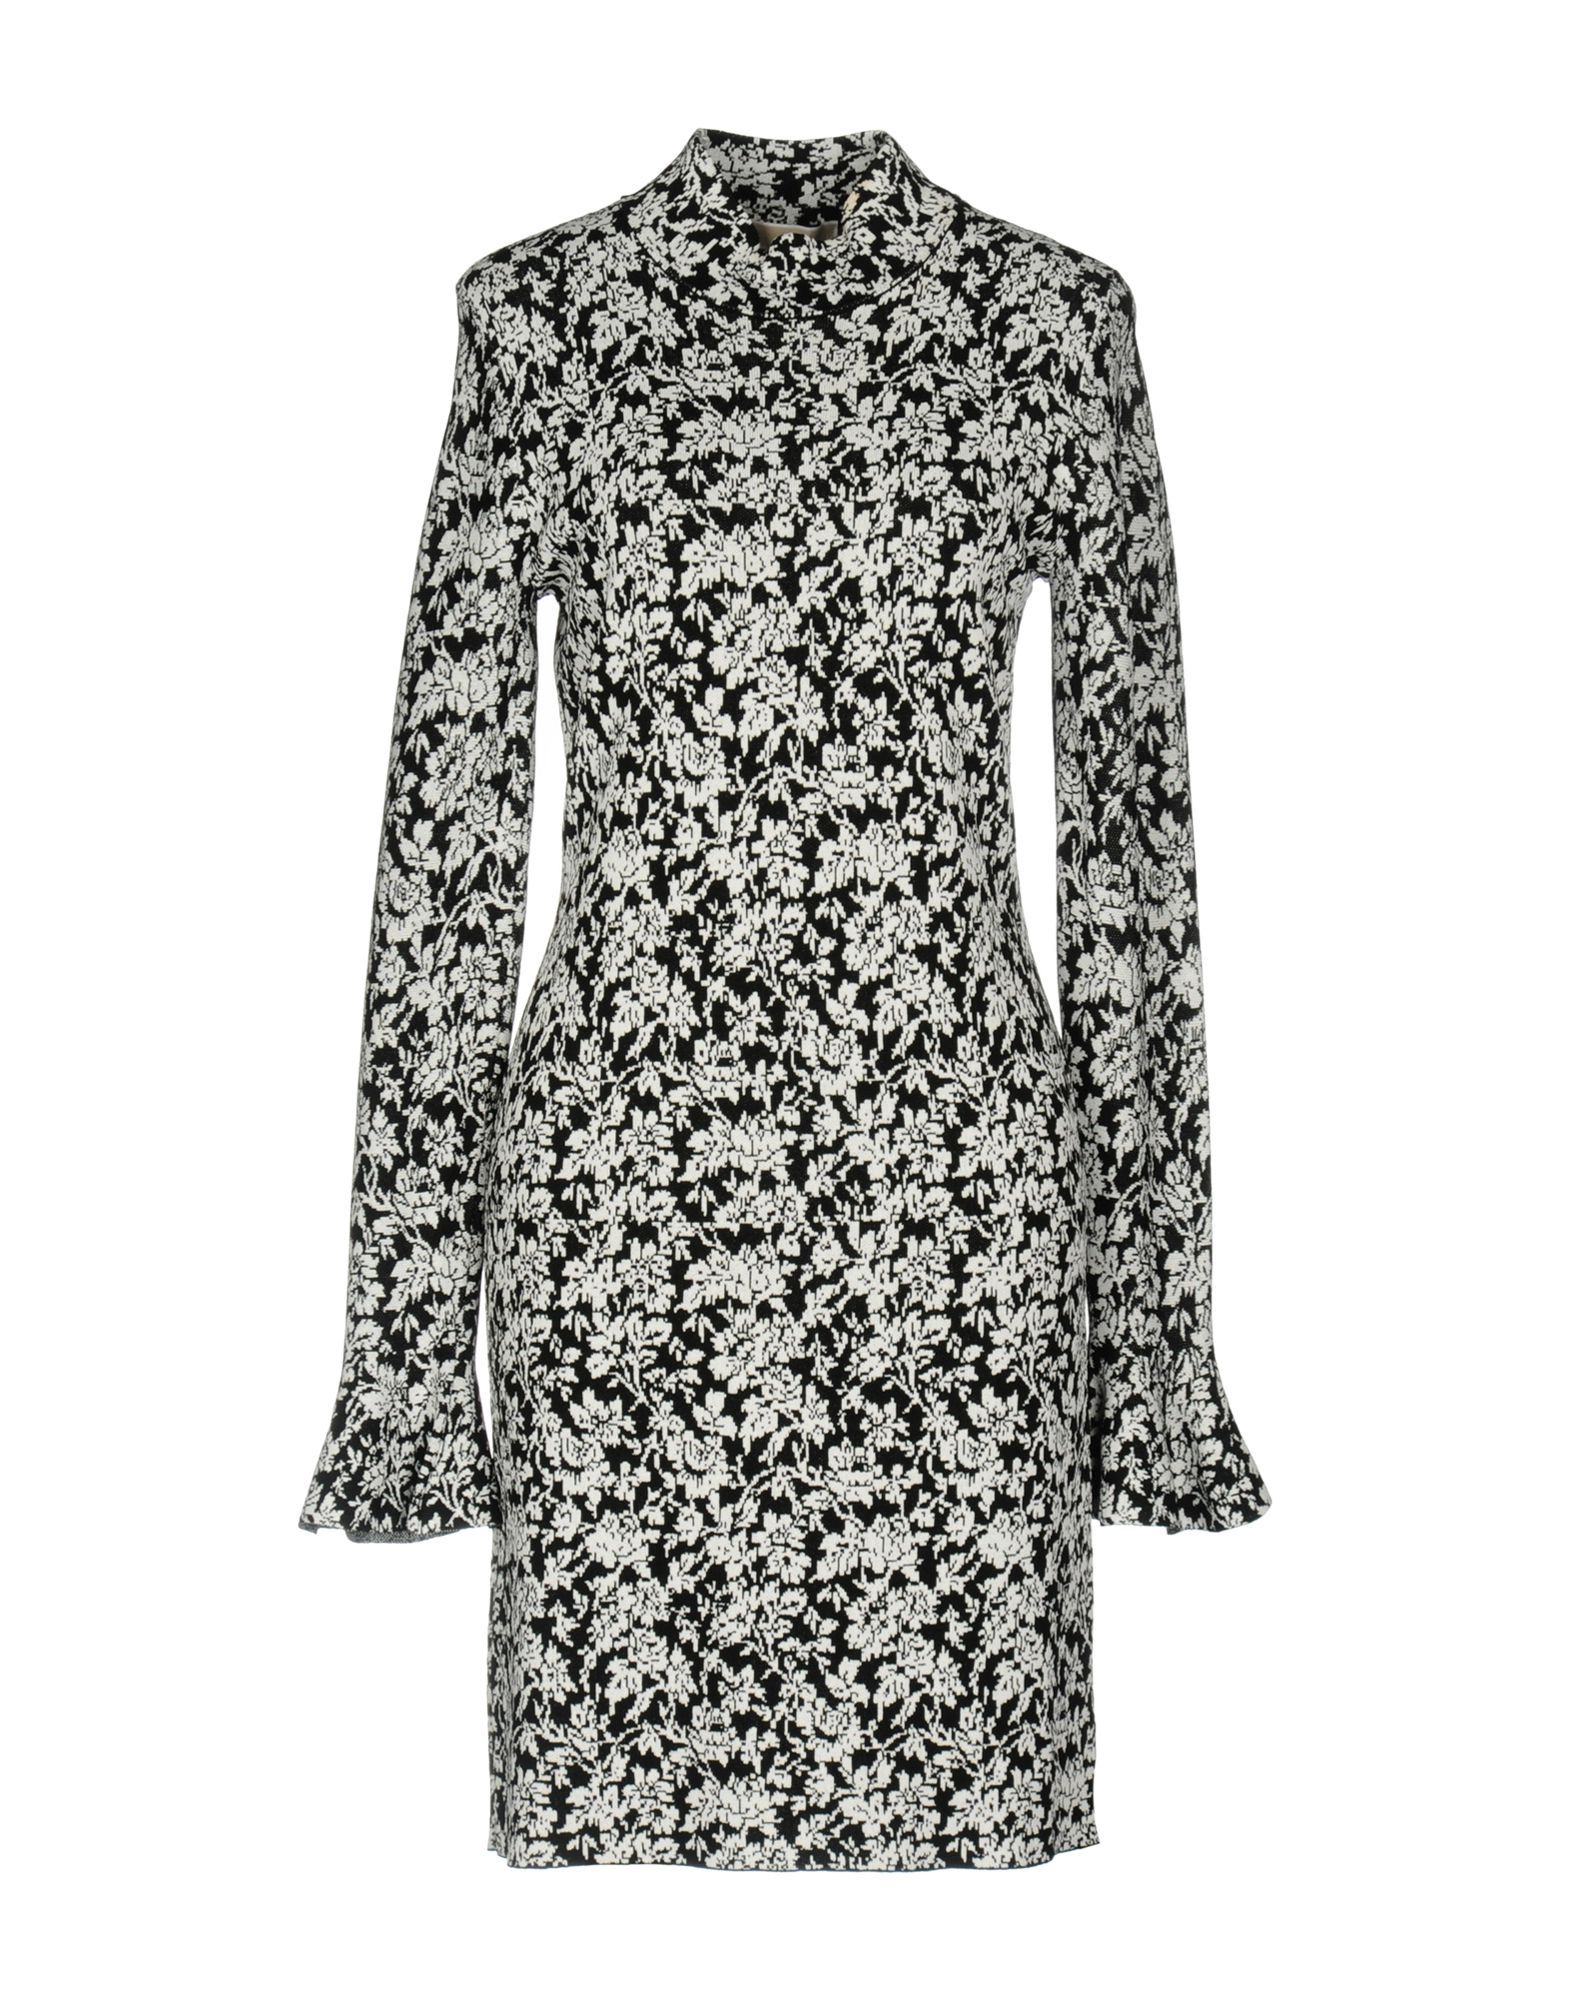 Michael Michael Kors Floral Design Knit Short Dress